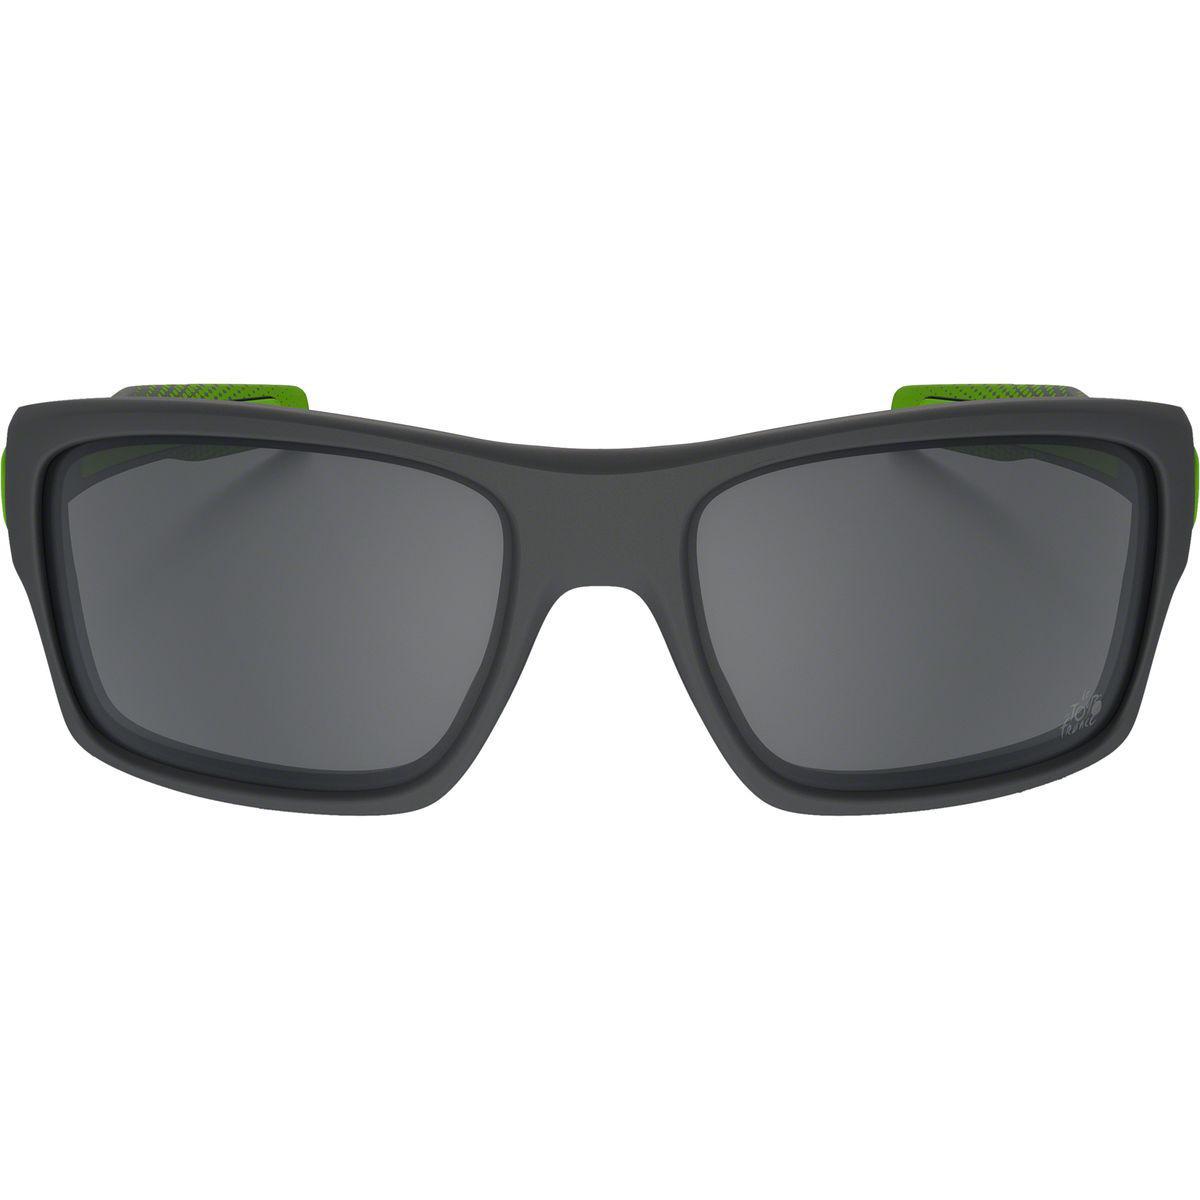 8bba6a13ef Lyst - Oakley Tdf Turbine Sunglasses - Polarized in Gray for Men